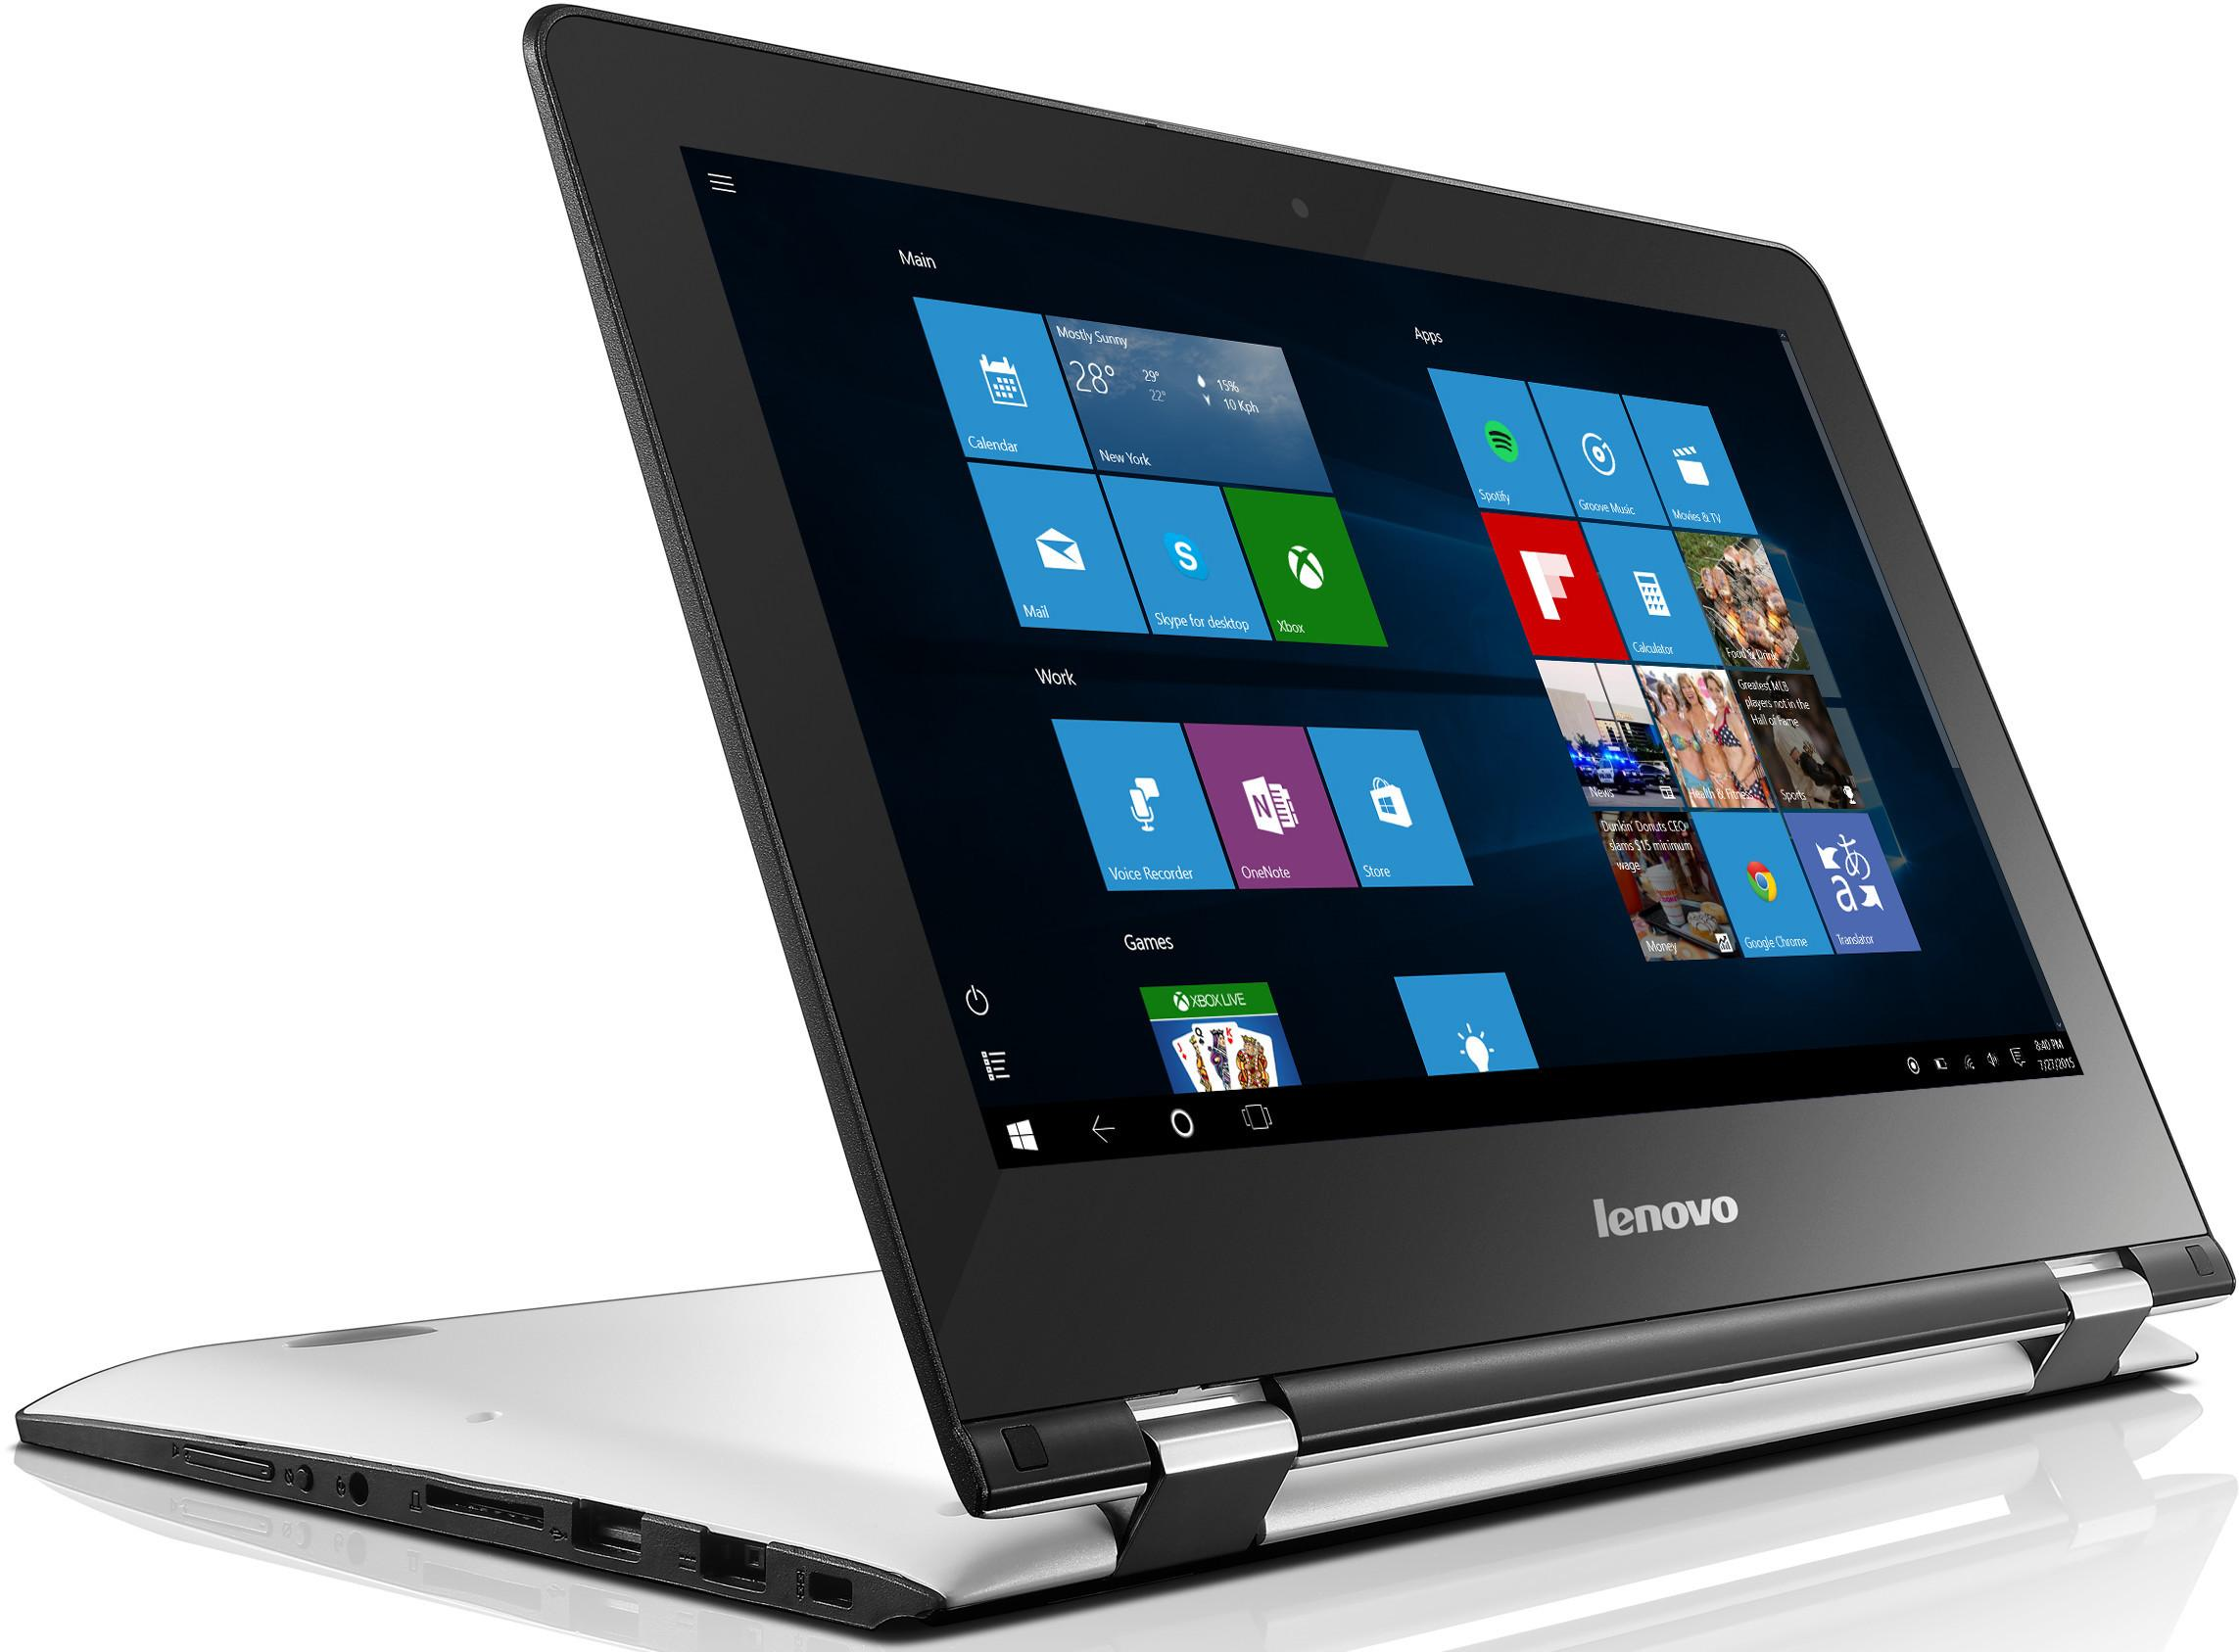 Lenovo IdeaPad Yoga 300 (80M100VSPB)